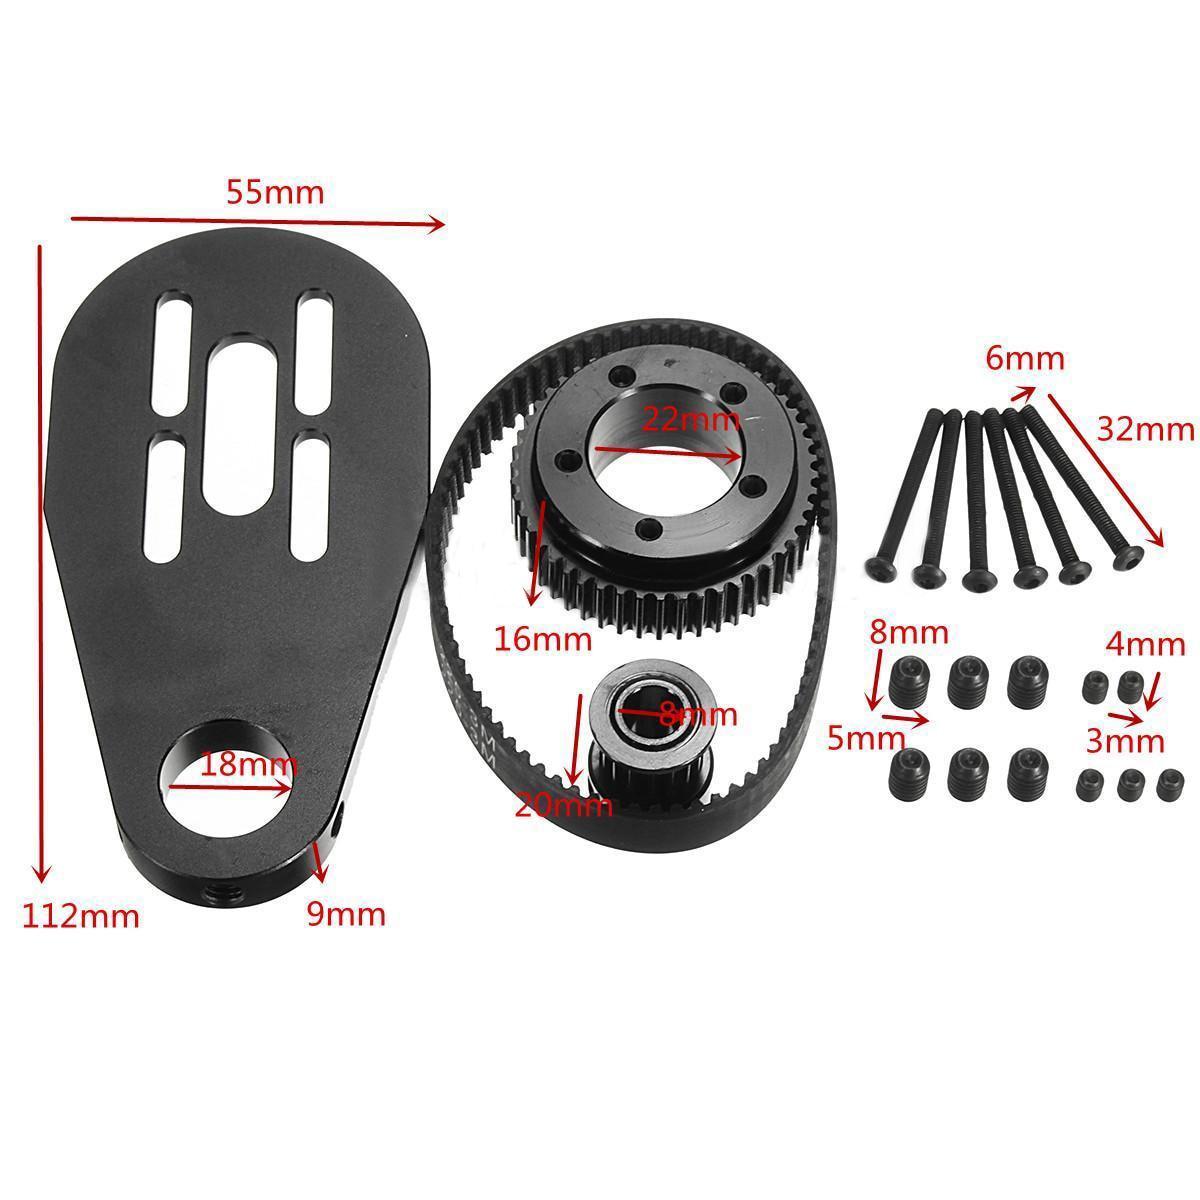 Stainless Steel Skate Board Electric Skateboard Accessories Belt Kit Motor Pulleys Mount For 72/70mm Wheels2/70mm Wheels